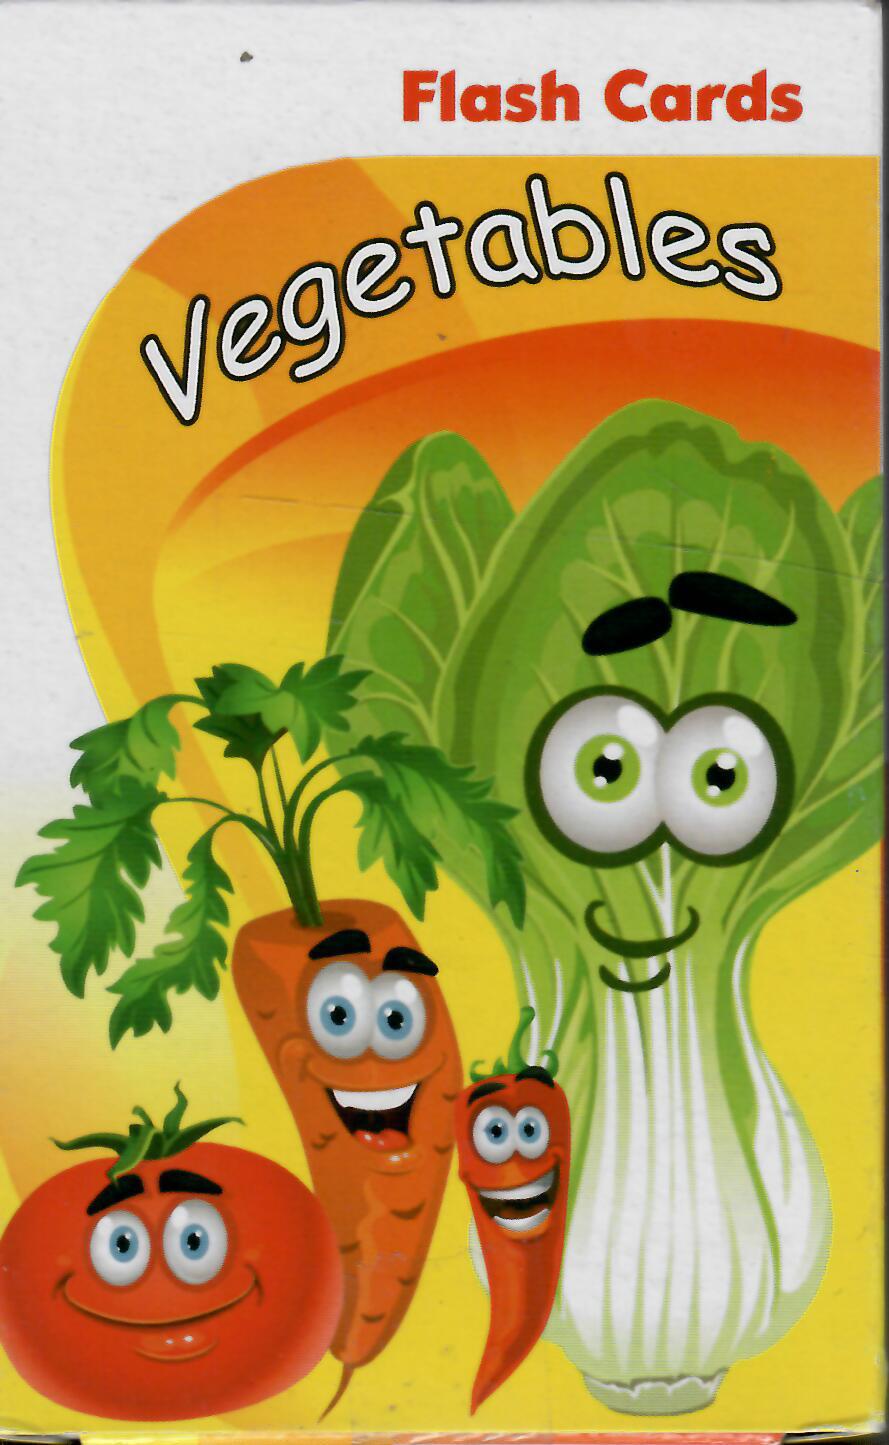 فلش کارت دو زبانه آموزش سبزي ها(انگليسي-فارسي)